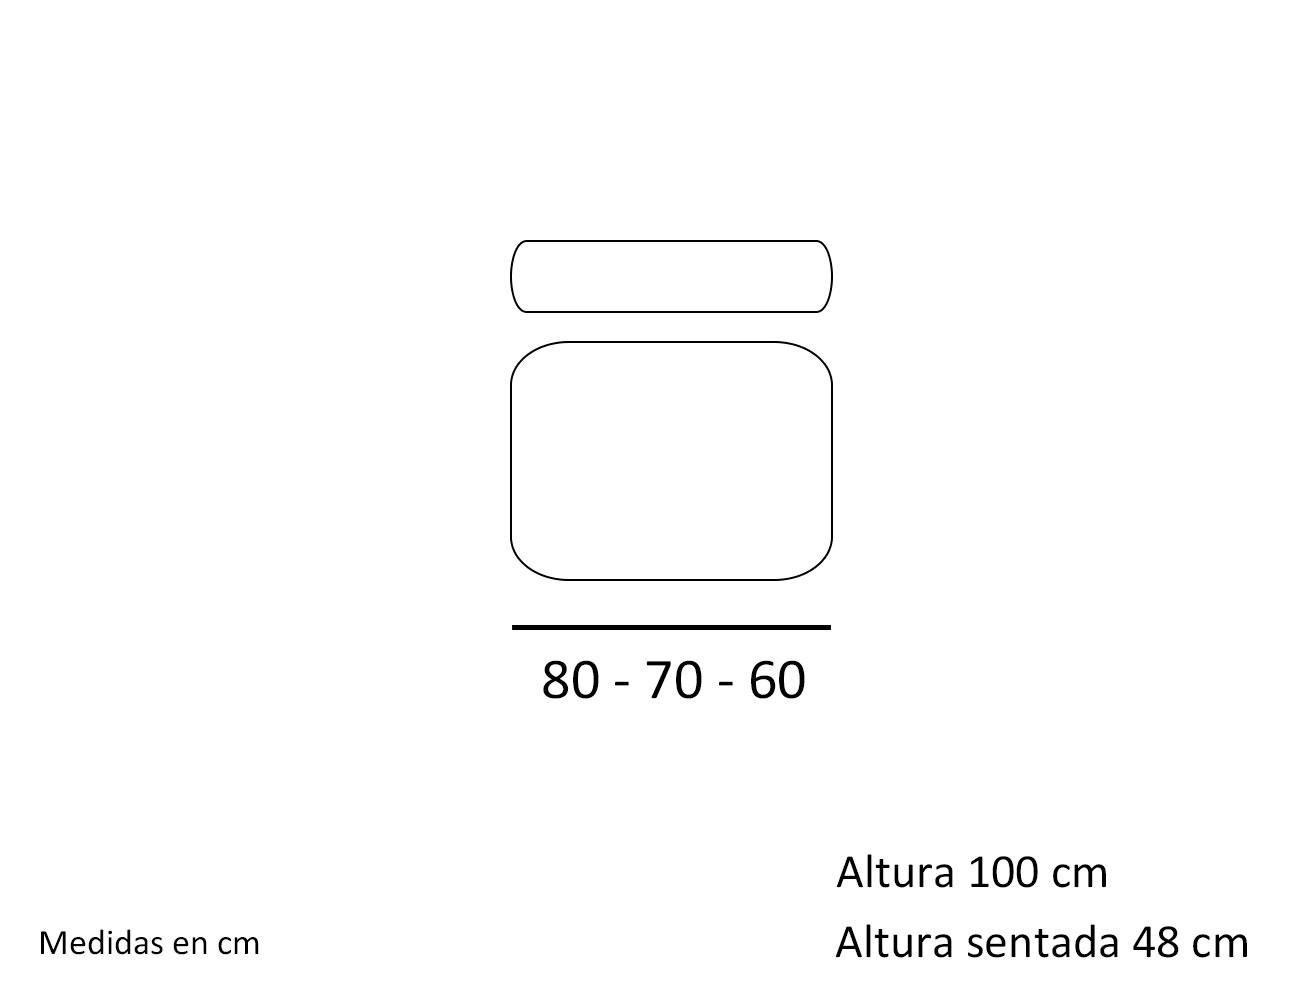 Croquis modulo 1 plaza sin brazo 80 70 60